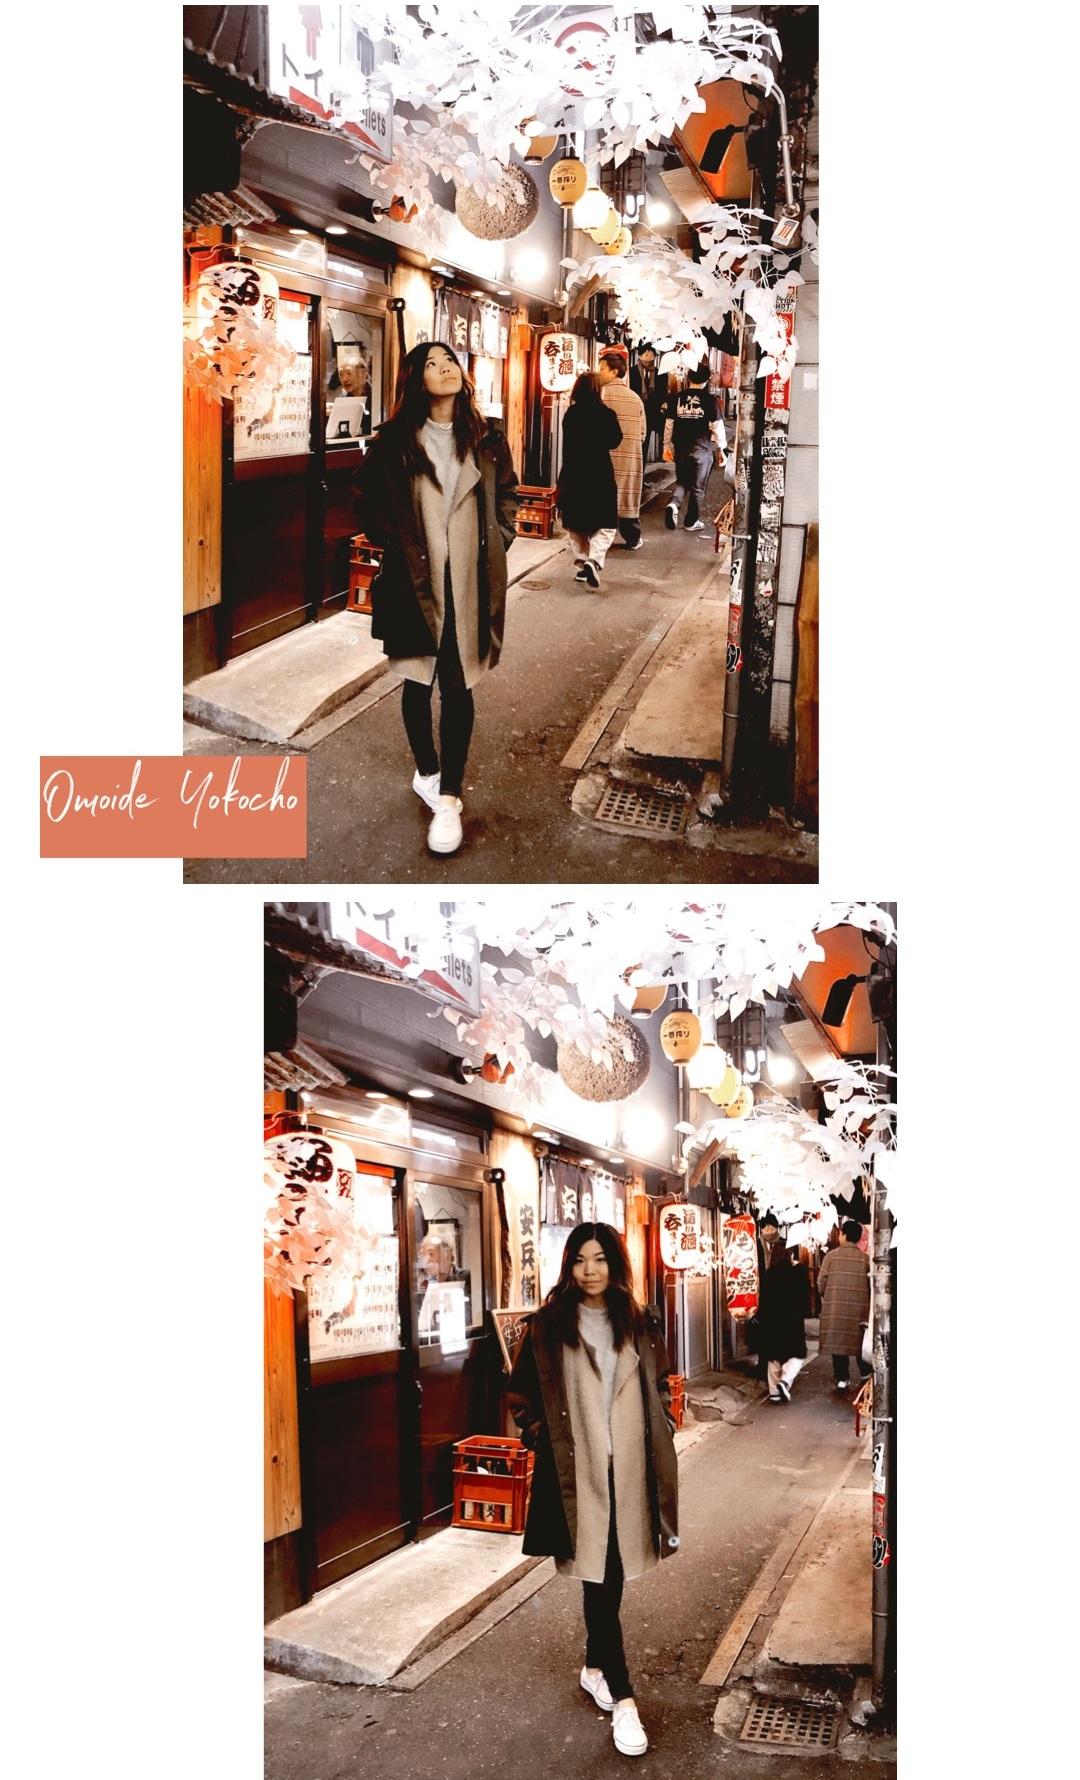 omoide+yokocho+piss+alley+tokyo+yakitori